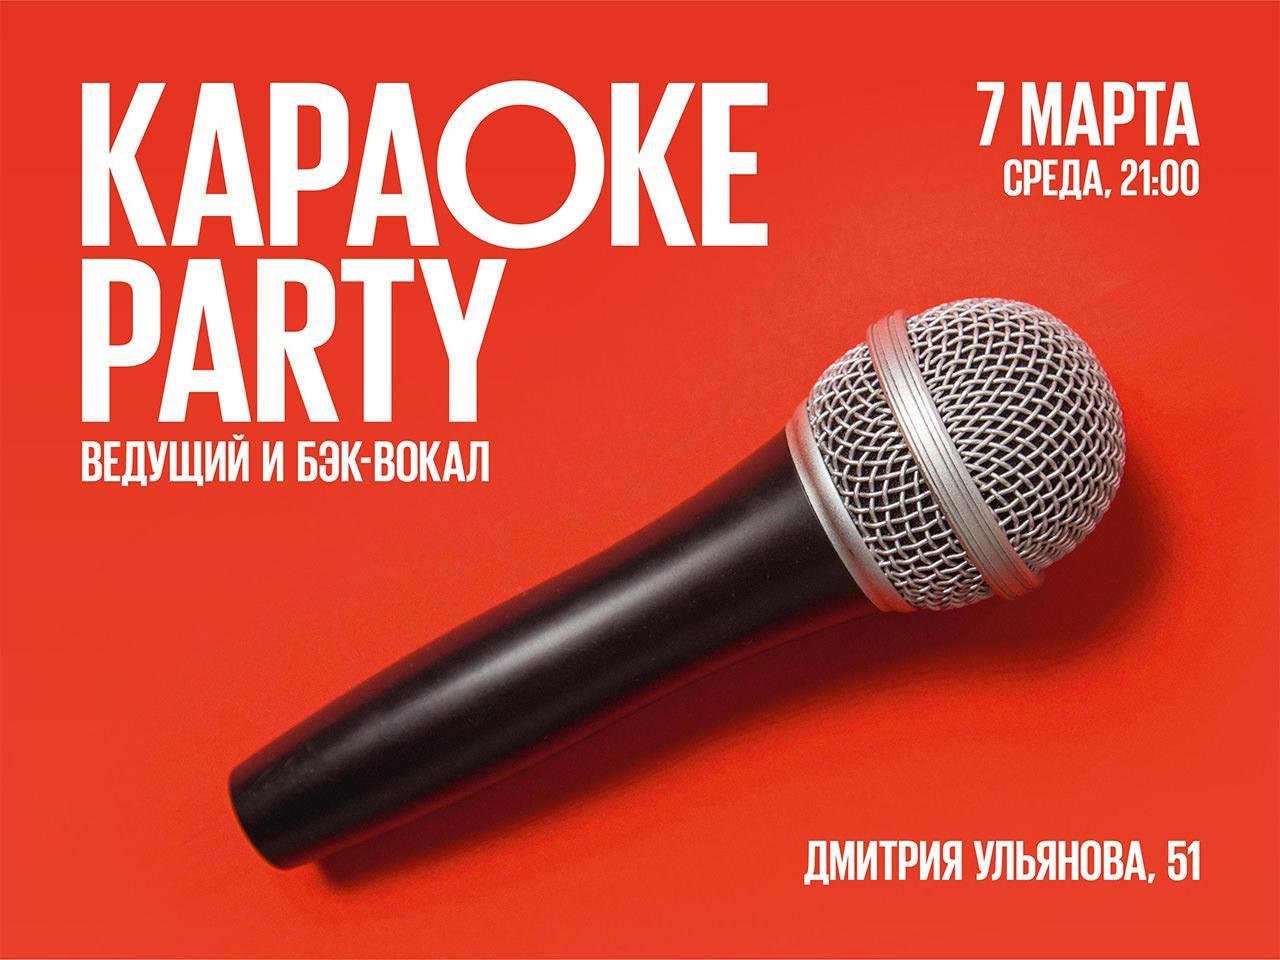 Караоке-вечеринка в Чайхоне №1 на ул. Дмитрия Ульянова!